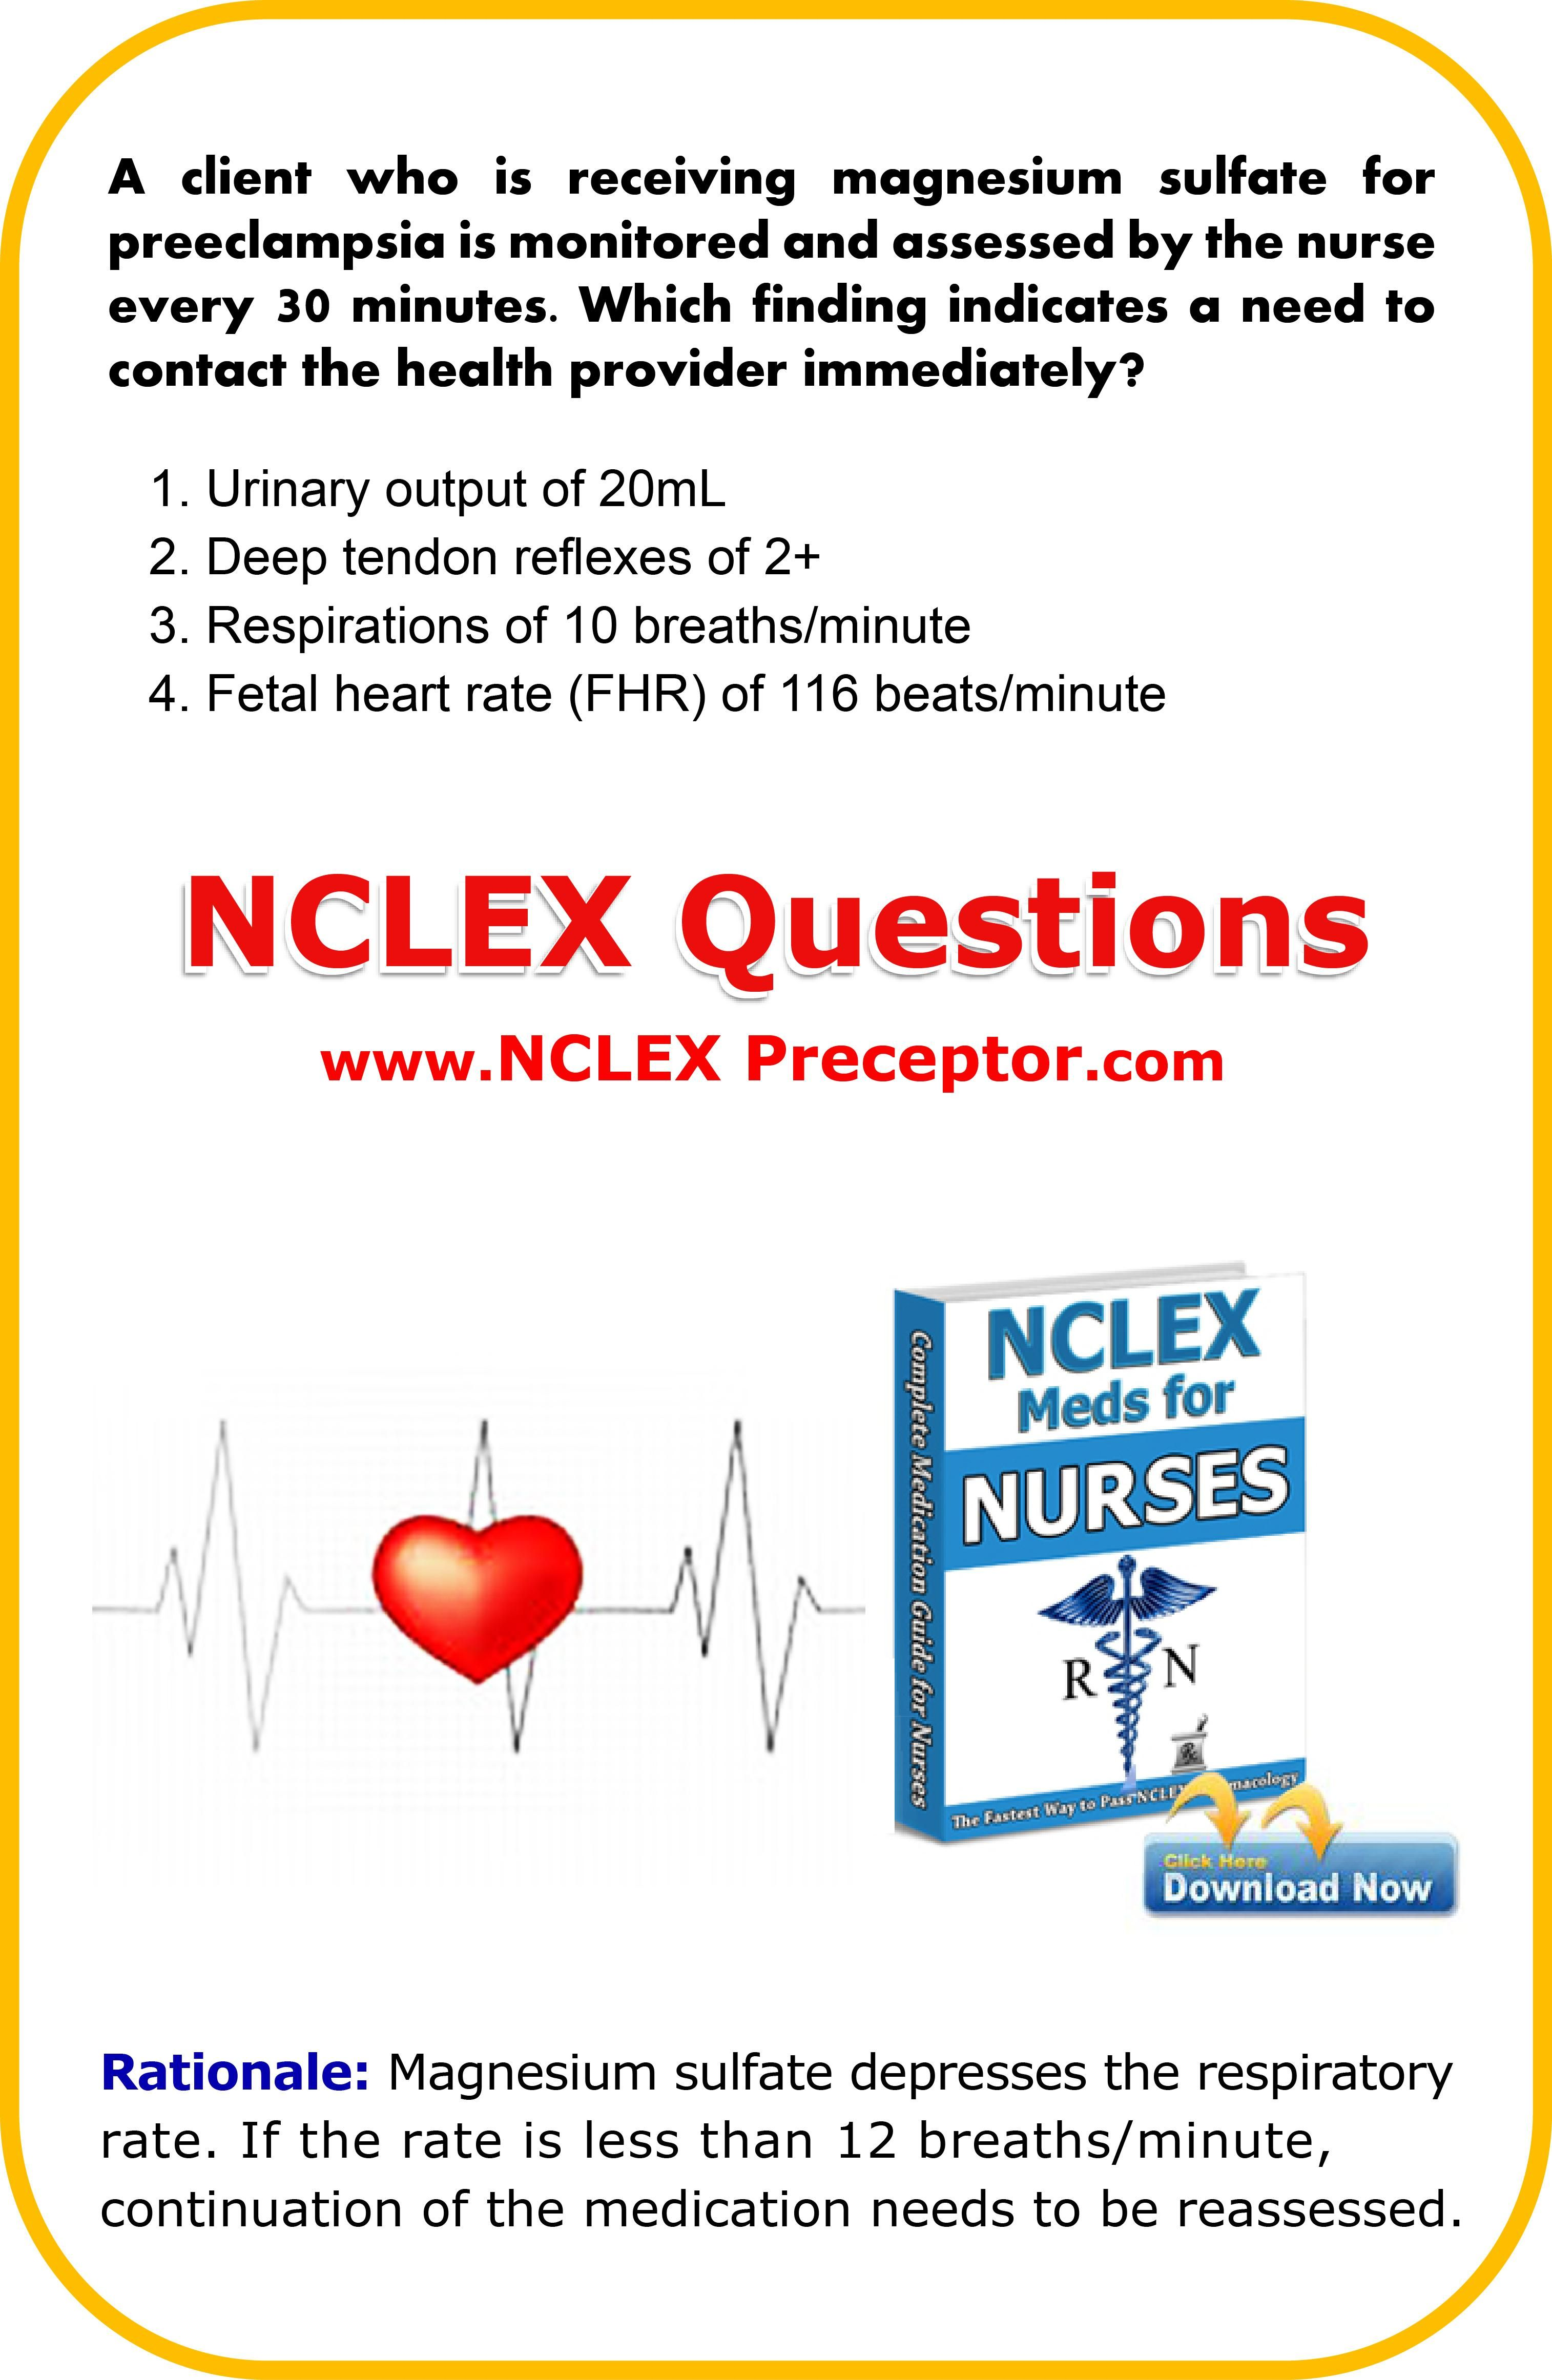 Free Nclex Tips For Registered Nurses Nursing Healthcare Tips To Pass Nclex Nclexcoremeasures Www Nclexpreceptor Co Nclex Nursing Books Nursing Information